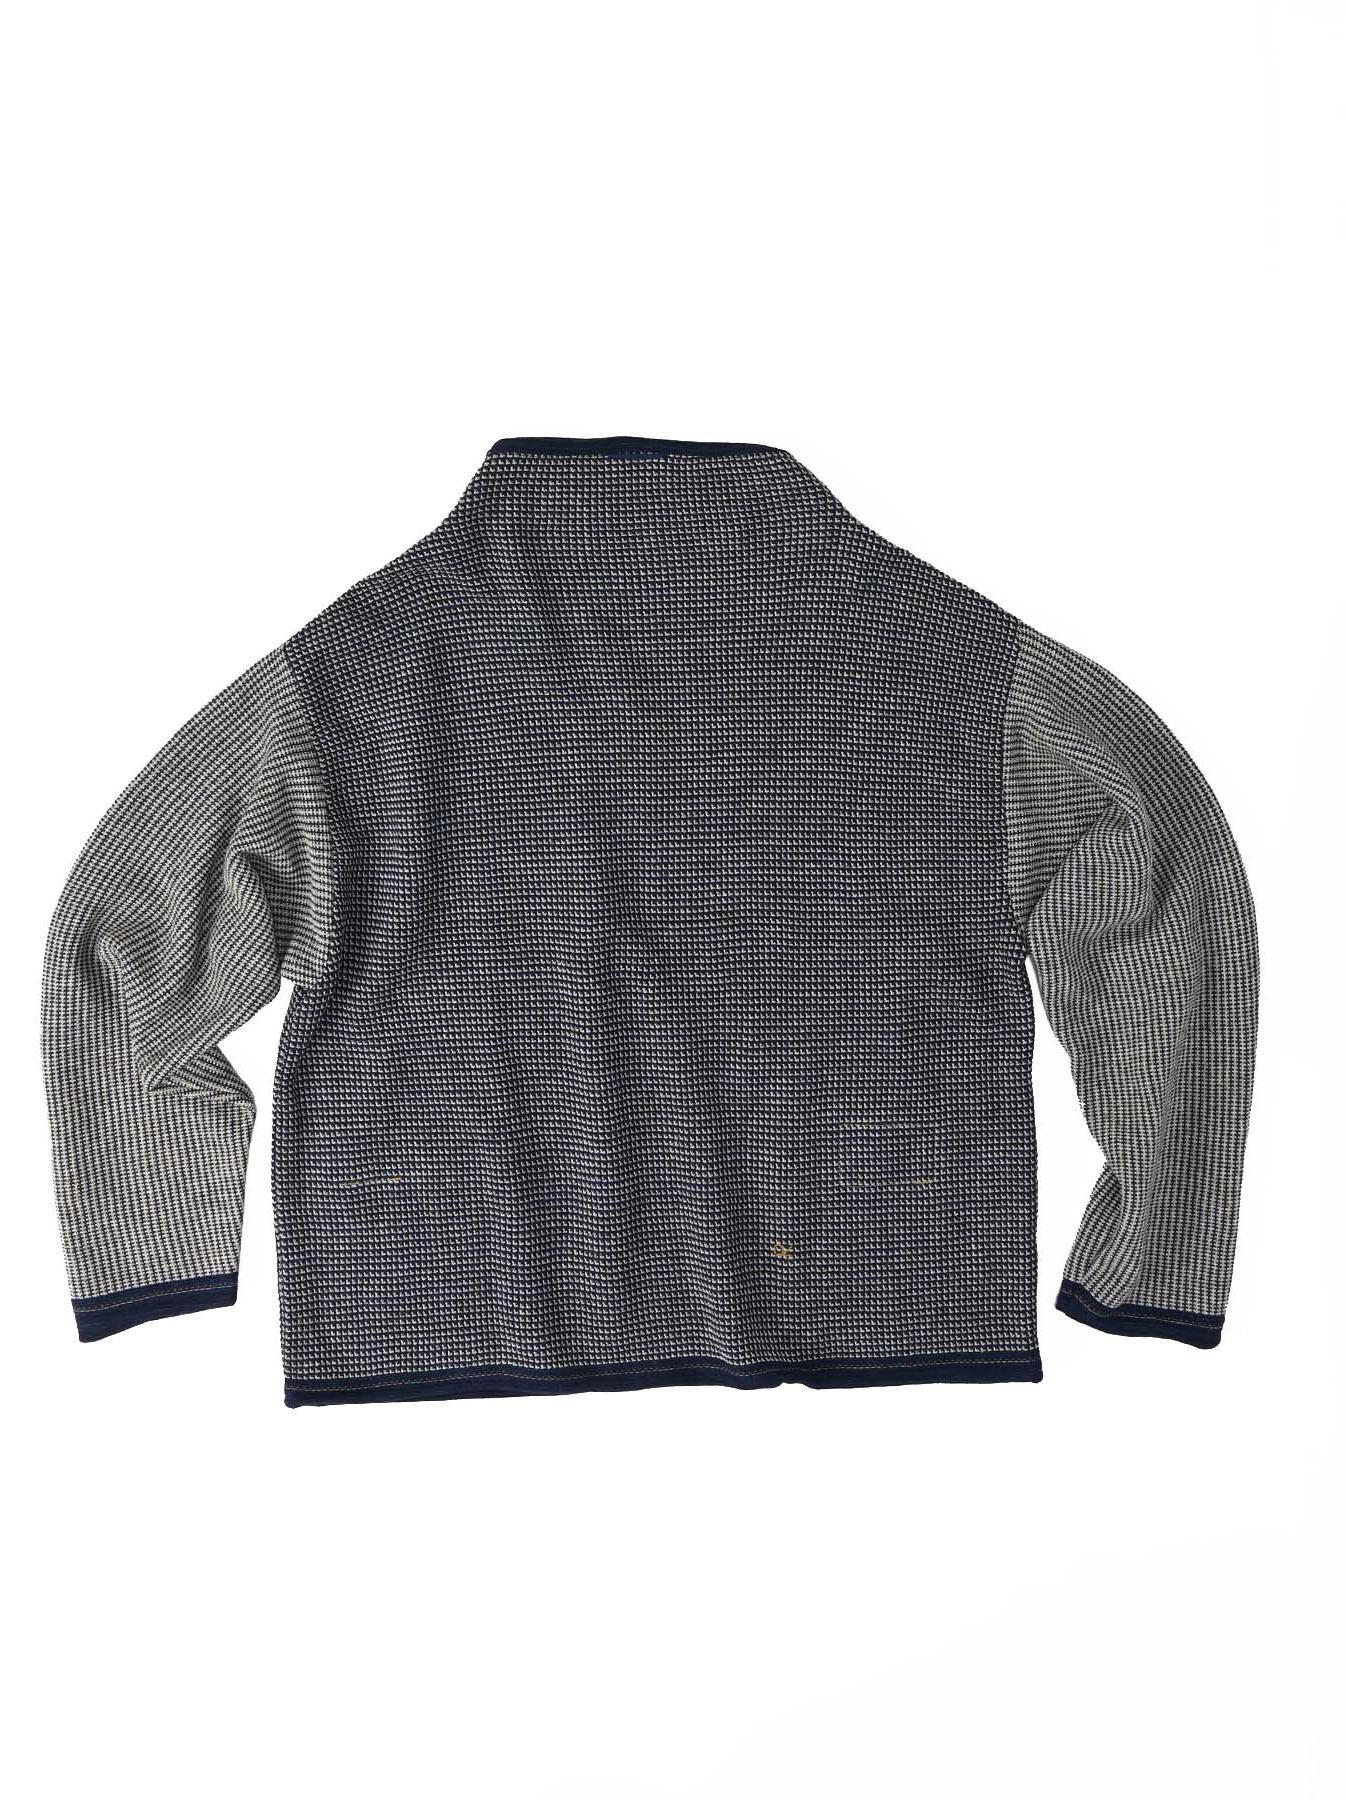 Indigo Tappet Kanoko Umahiko Sweater-11